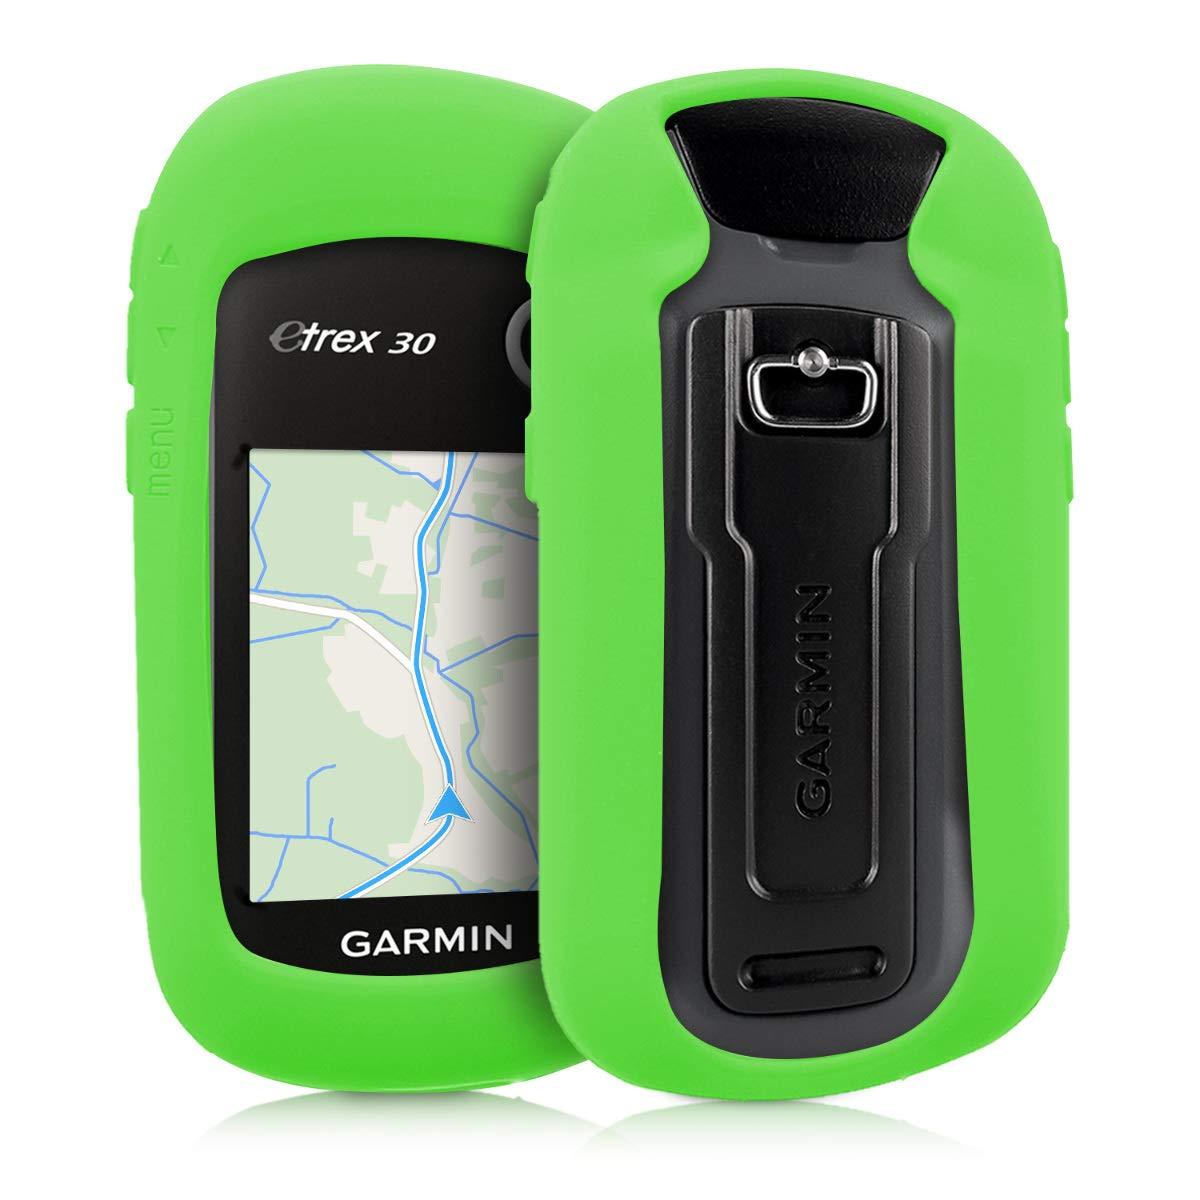 Schutzh/ülle f/ür Garmin eTrex 10//20//30//201x//209x//309x GPS Handger/ät in Blau kwmobile Garmin eTrex 10//20//30//201x//209x//309x H/ülle